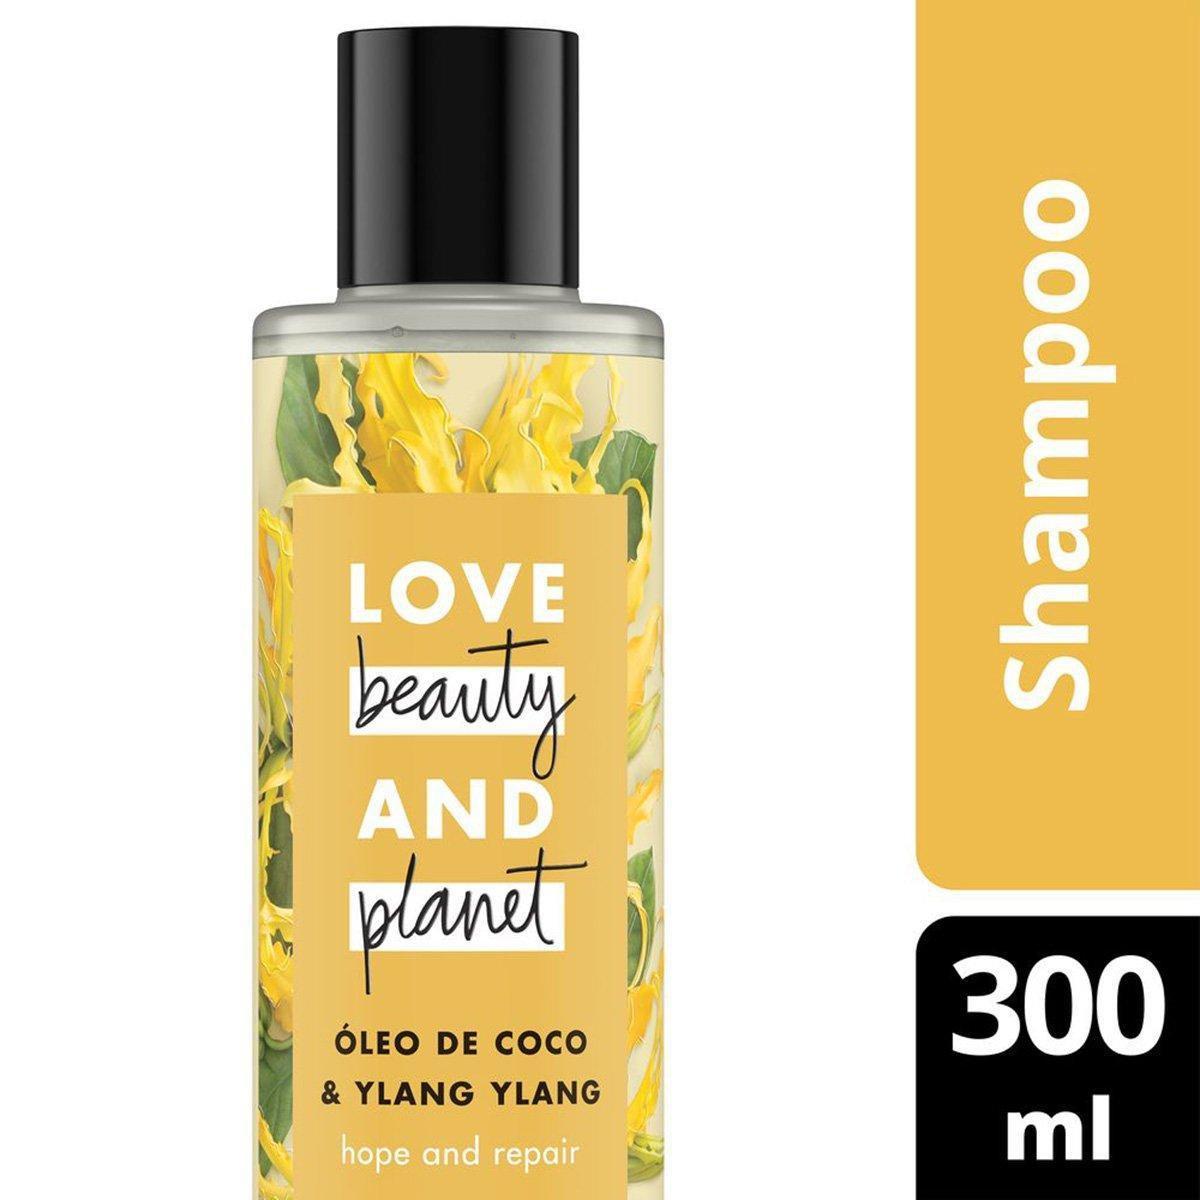 Shampoo Hope and Repair Óleo de Coco & Ylang Ylang Love Beauty and Planet 300ml